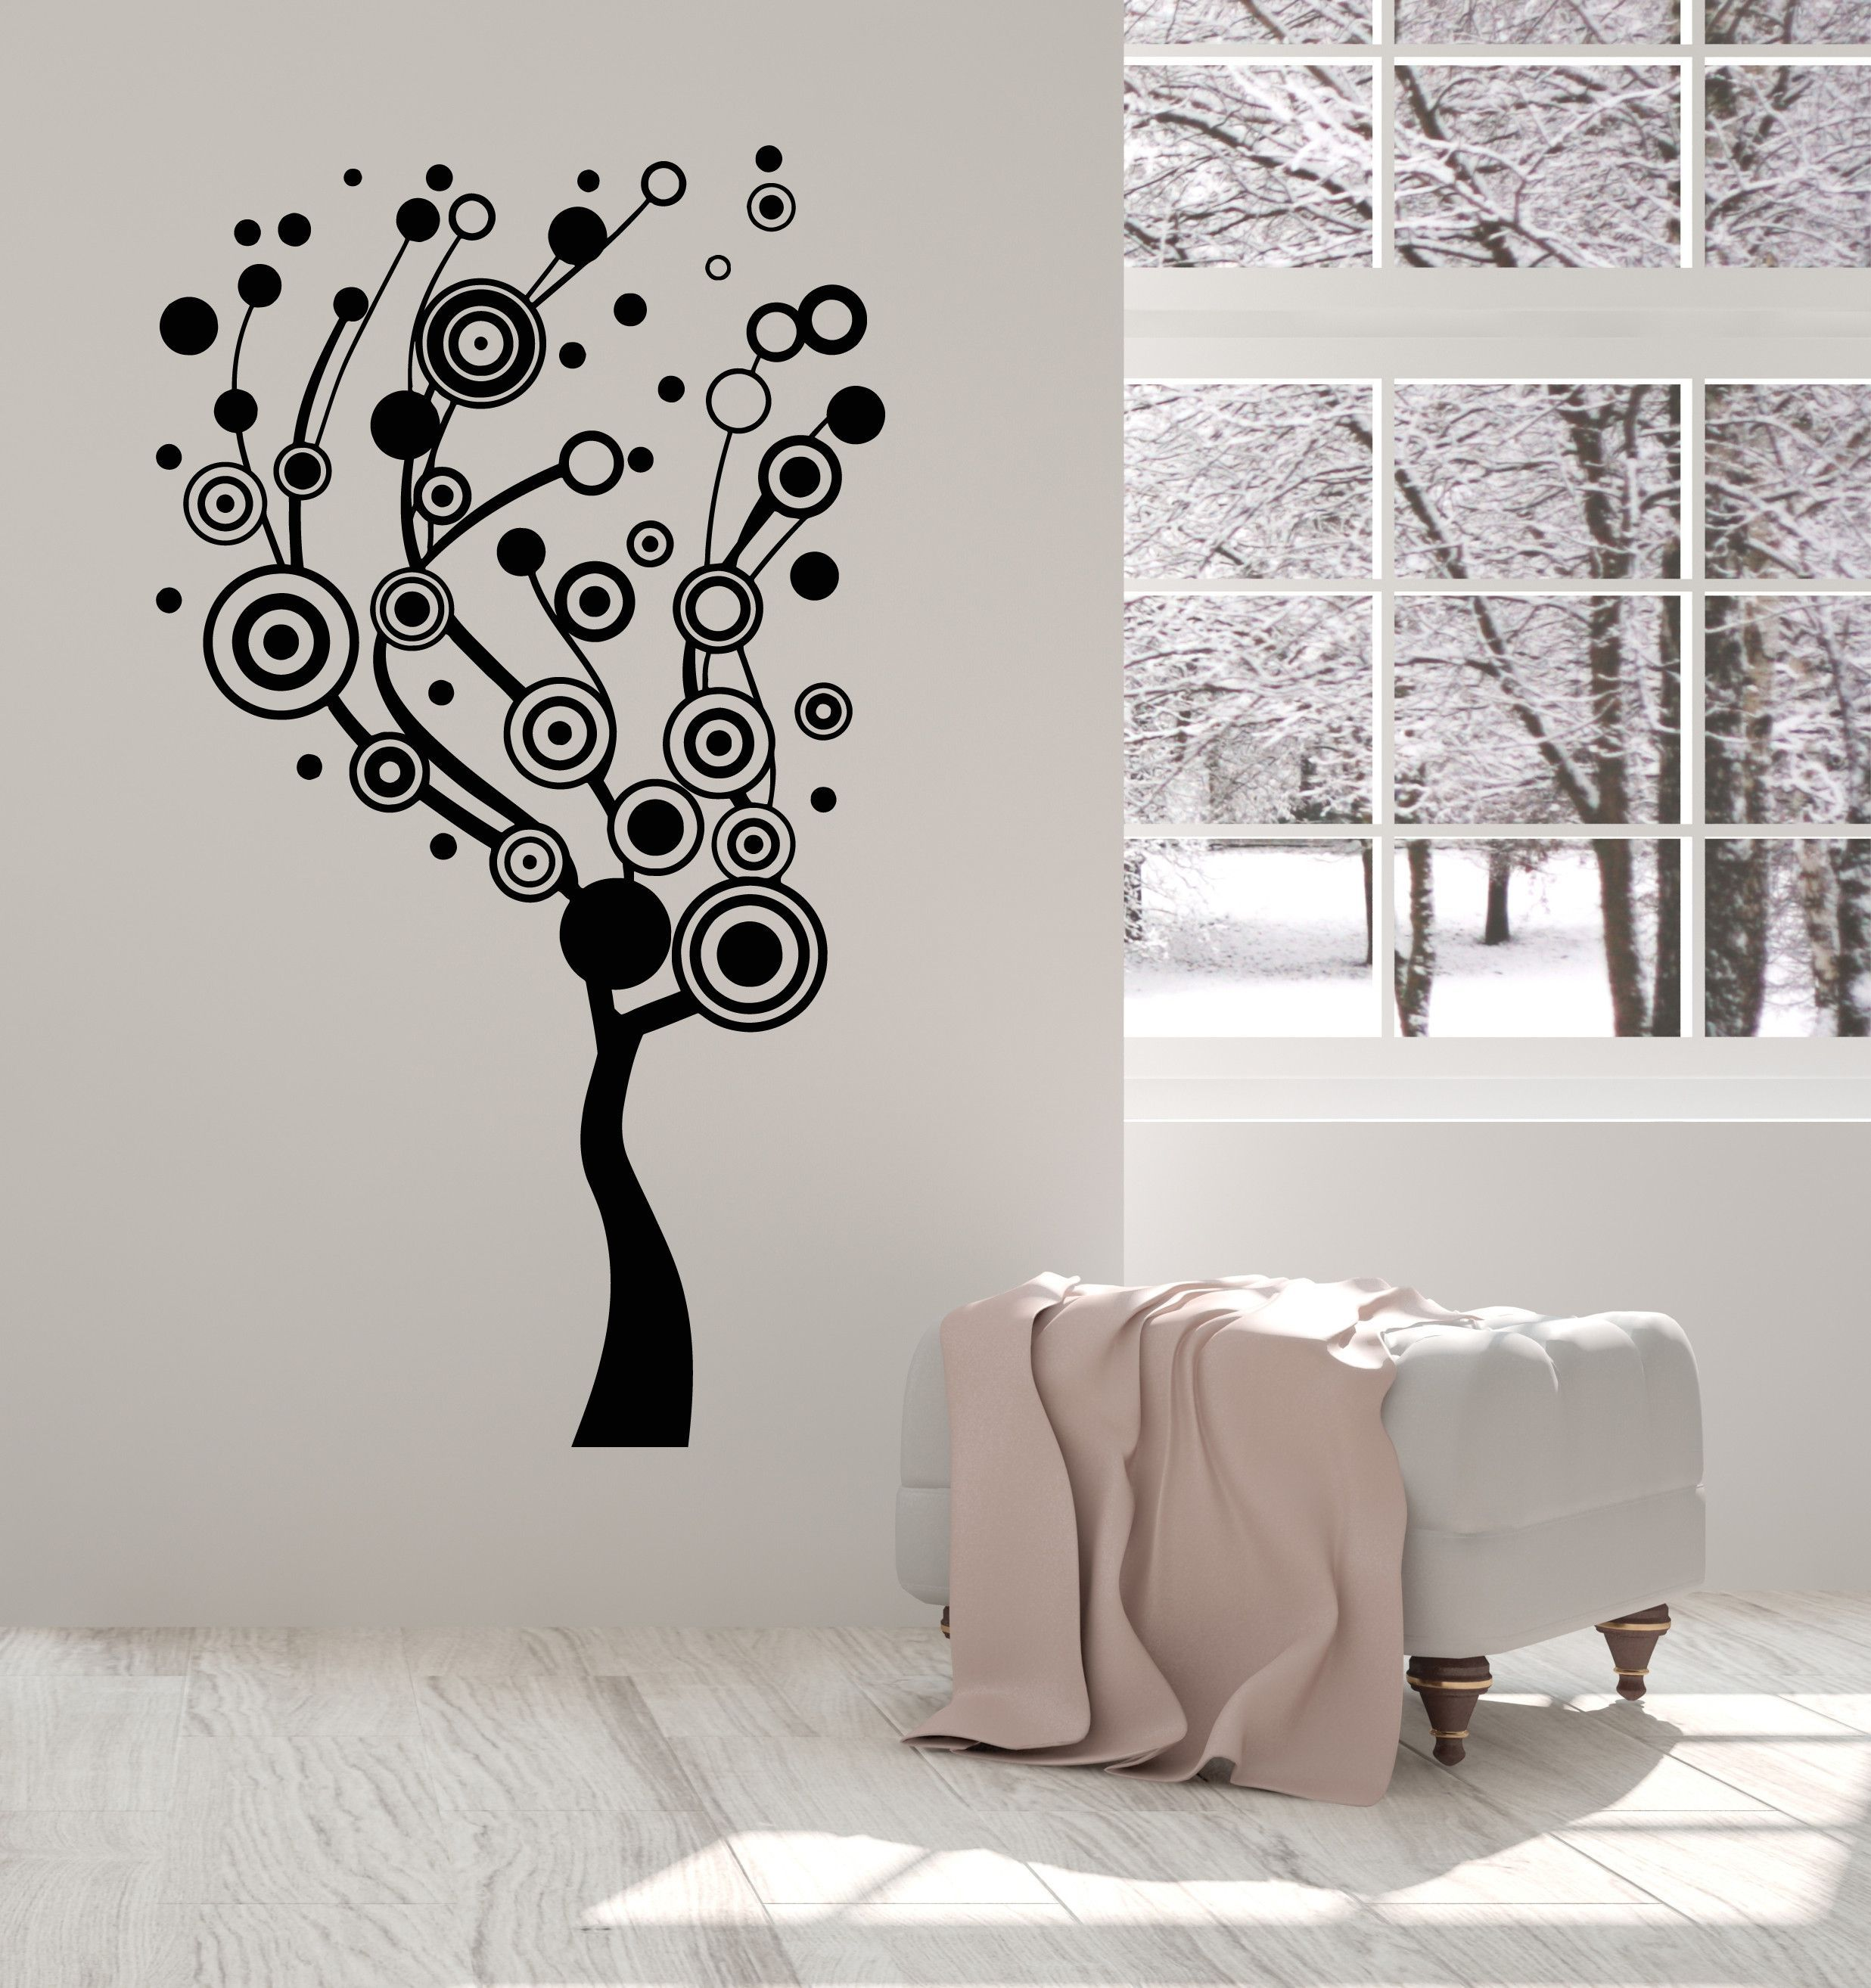 Vinyl Wall Decal Abstract Tree Circles Home Interior Ideas - Vinyl wall decals abstract